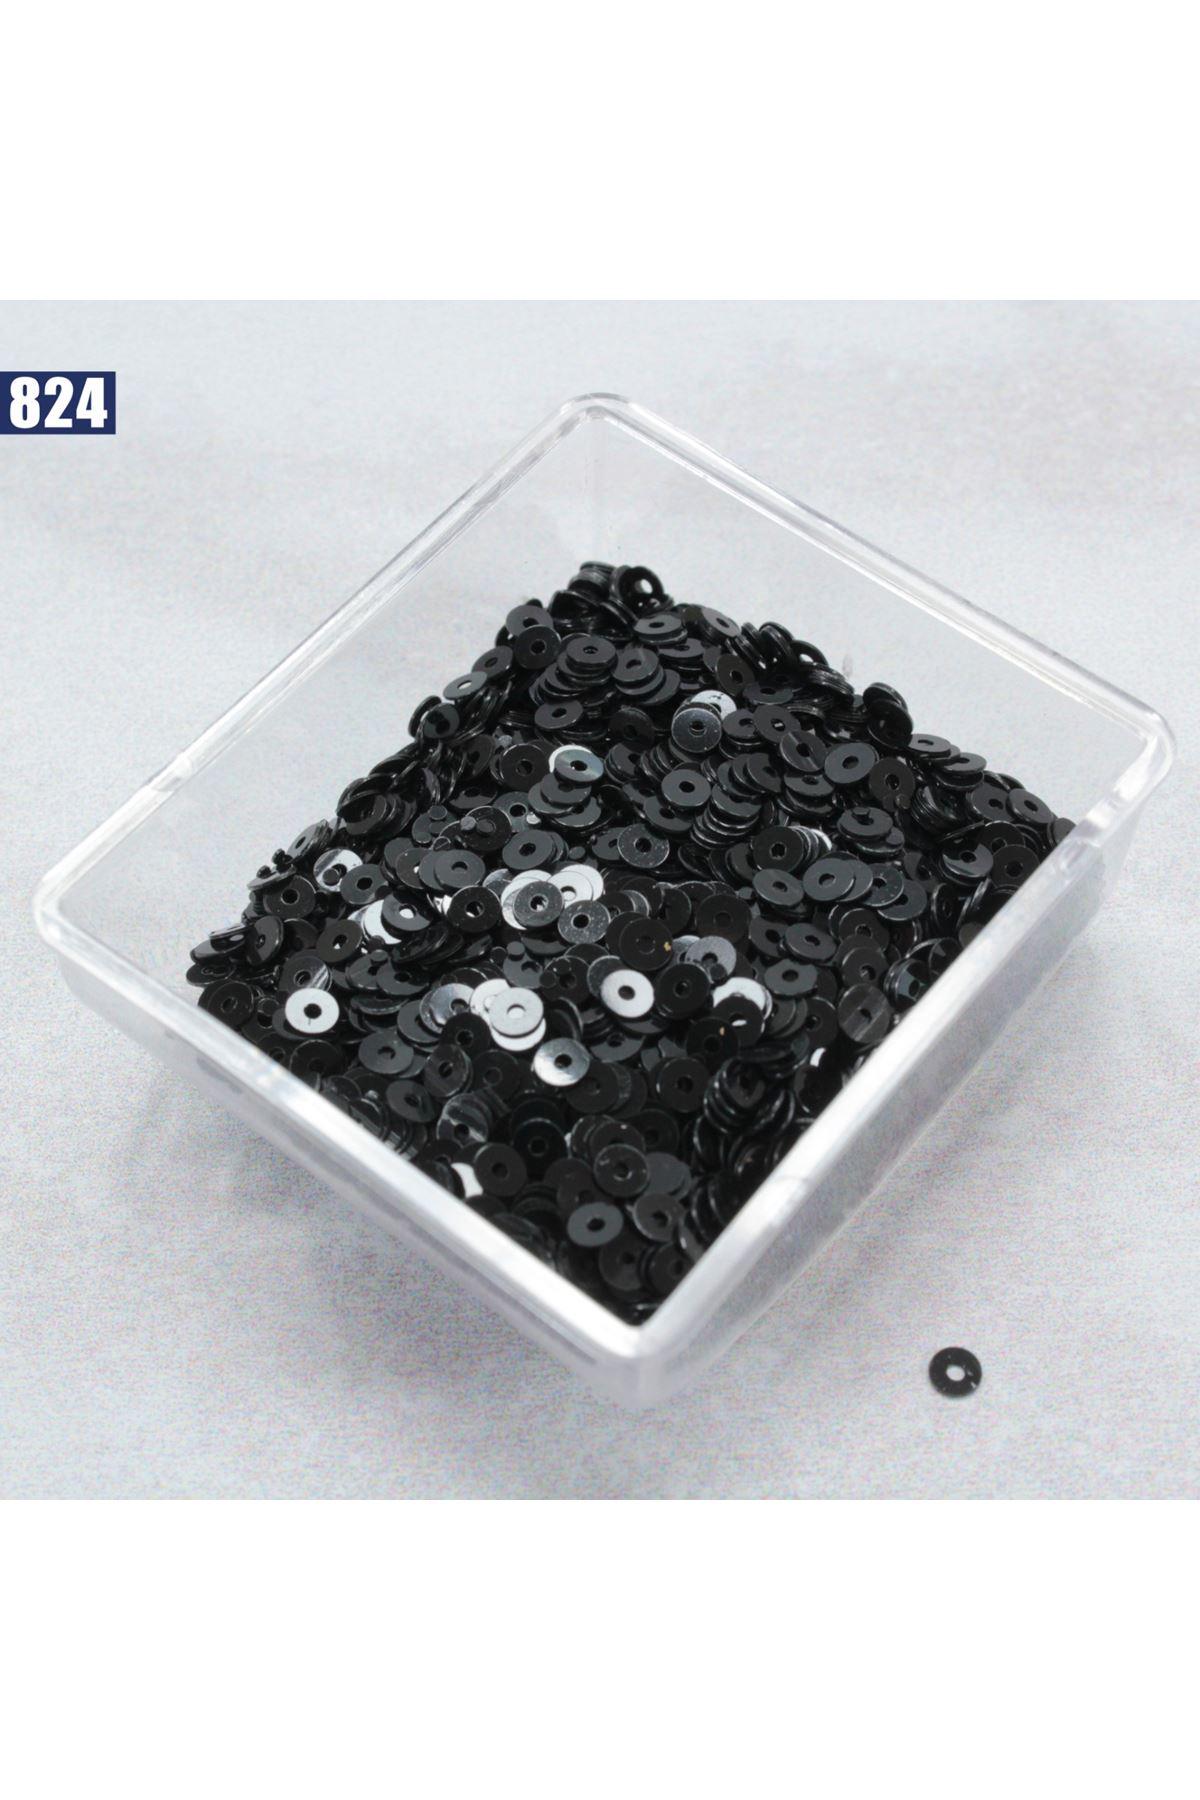 Pul 10 gram - 824